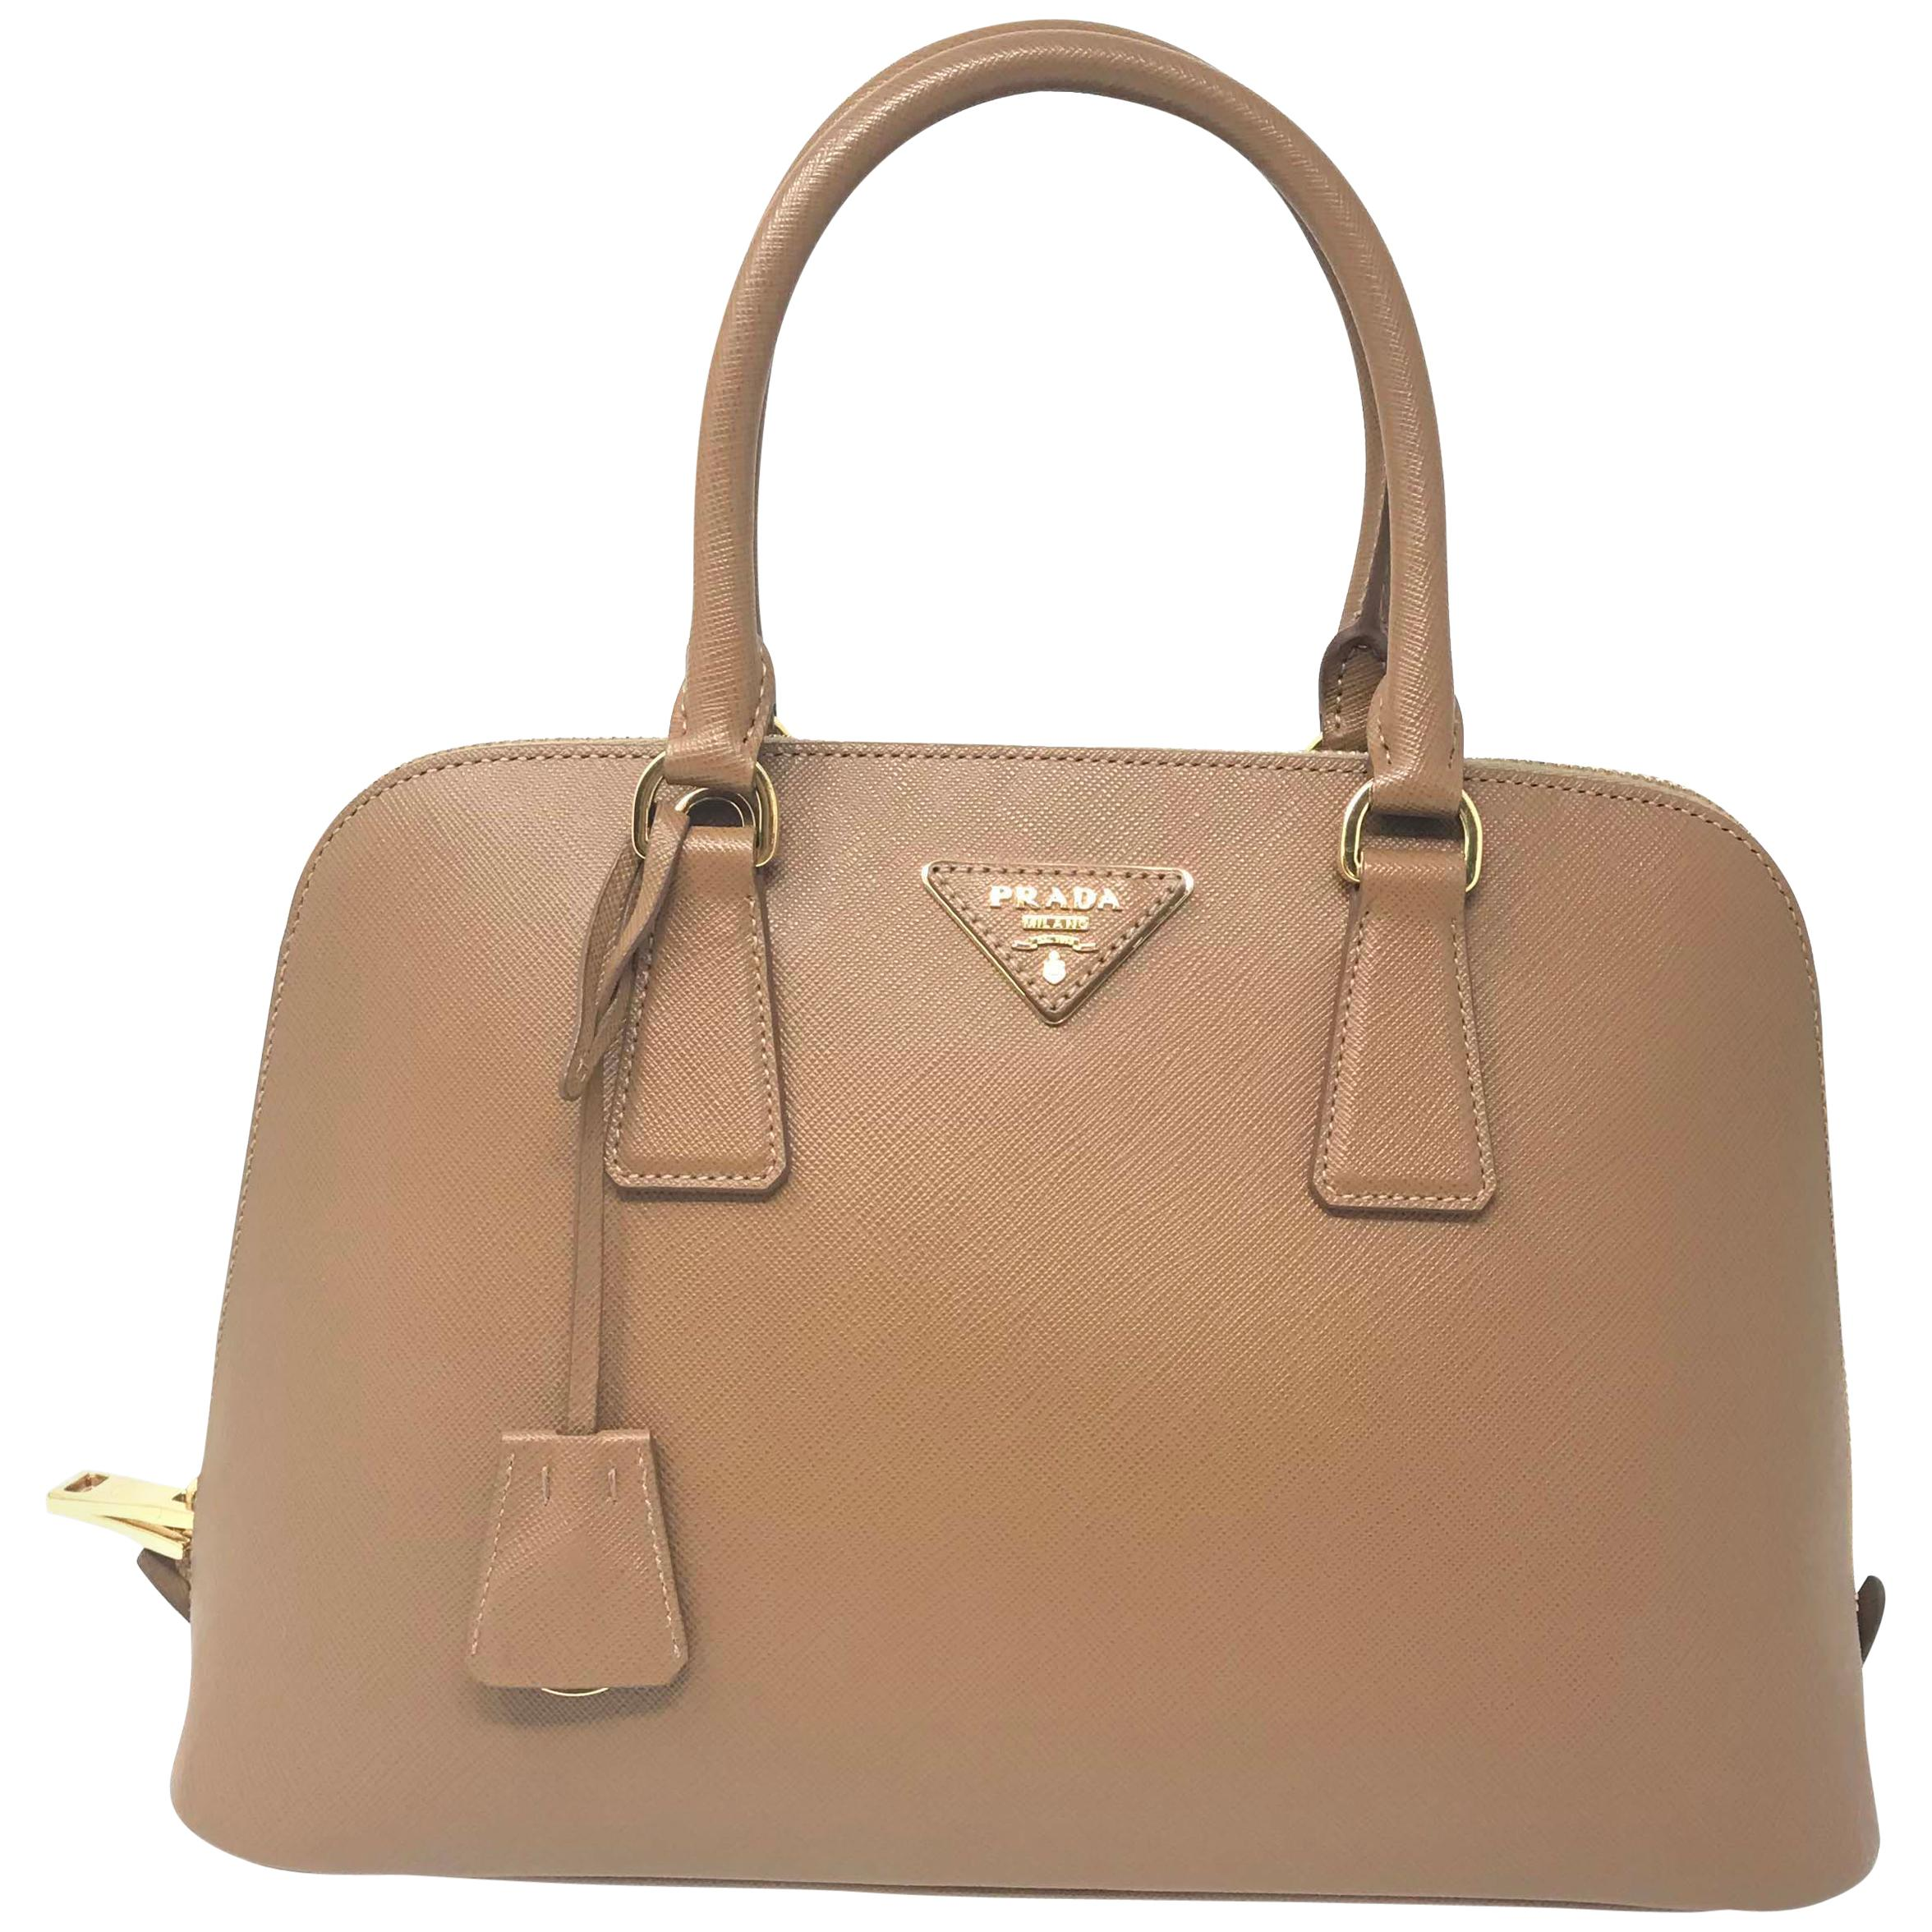 Prada 1BA837 Saffiano Leather Caramel Promenade Ladies Top-handle Bag